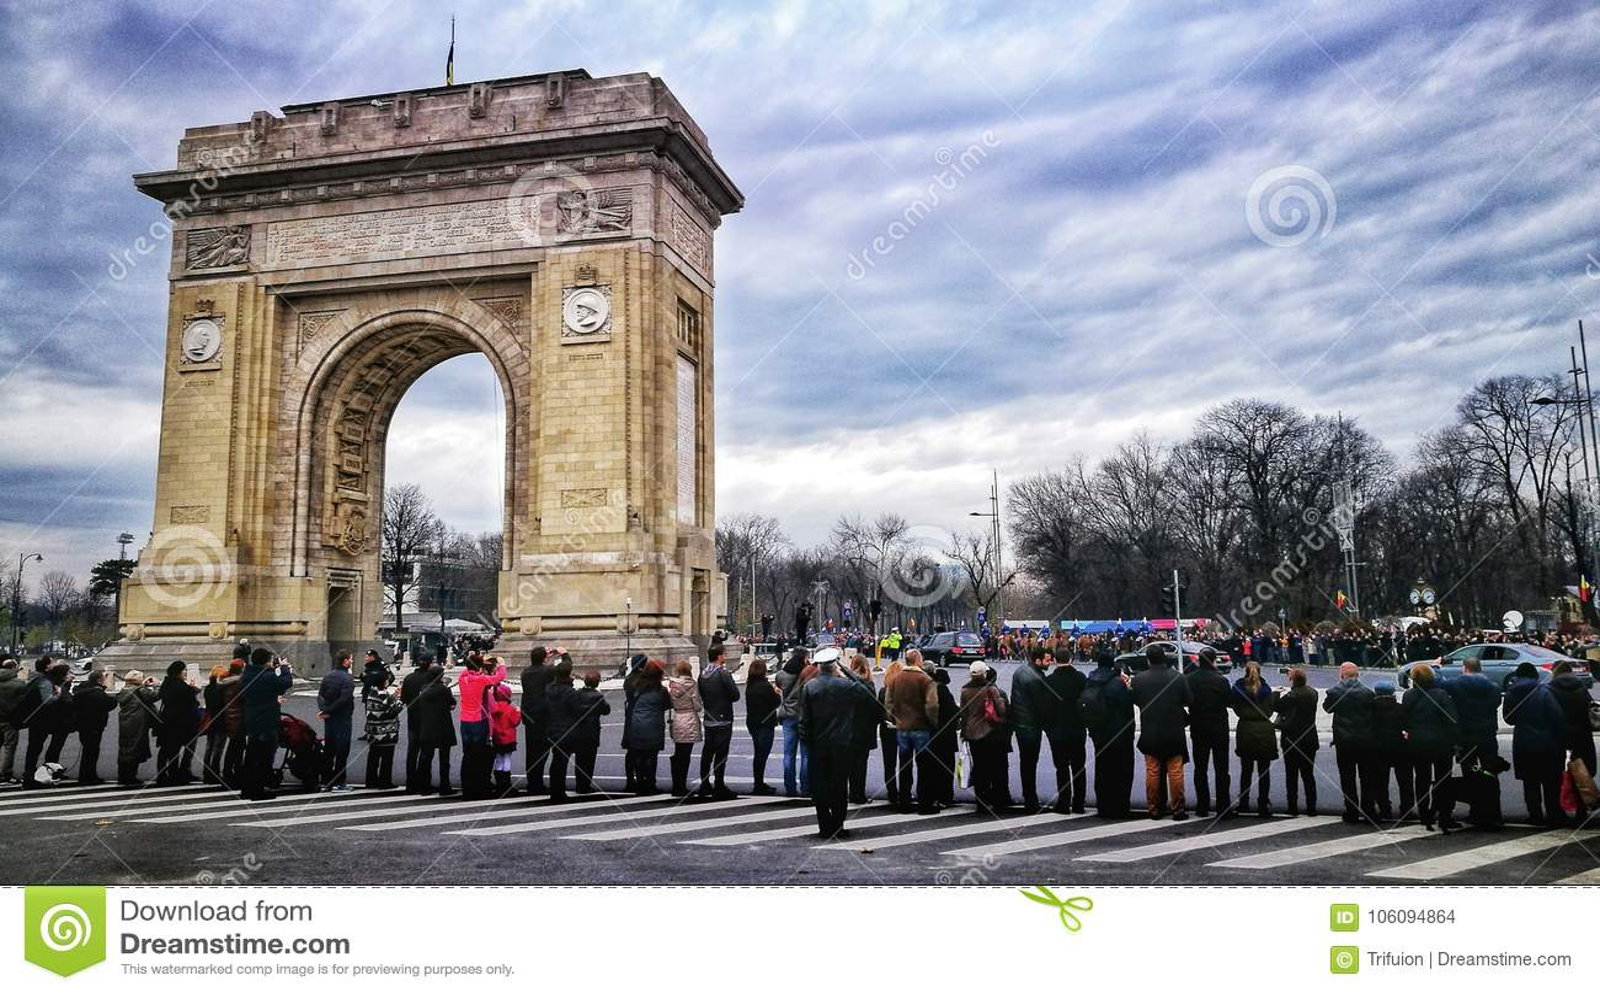 Koning Mihai I Begrafenissen - Arch DE Triumph Boekarest Roemenië